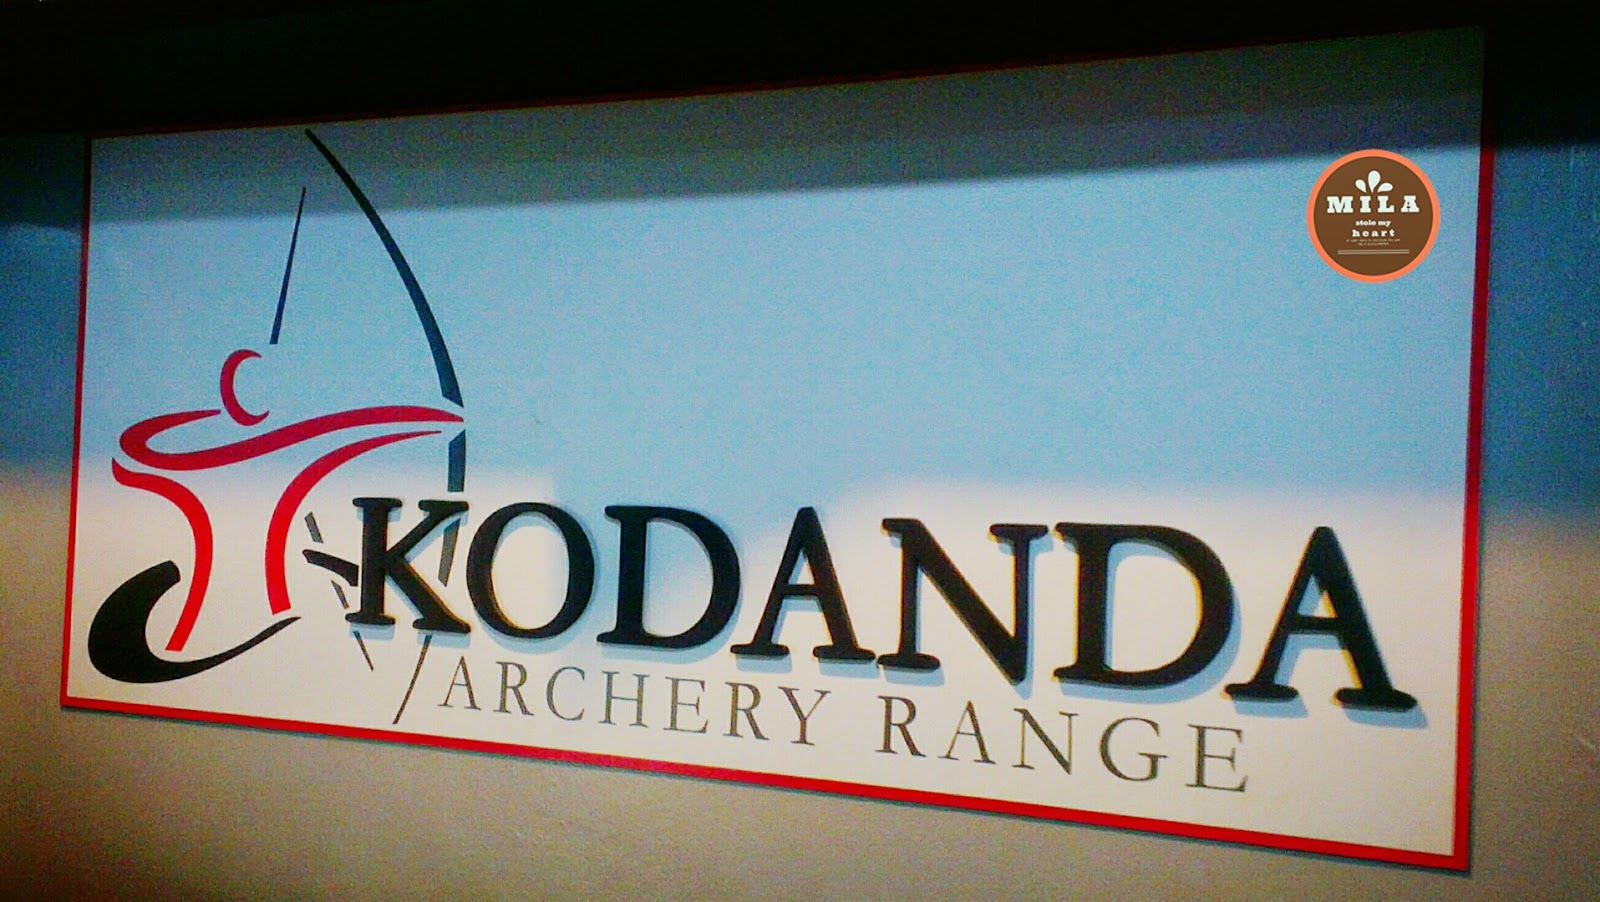 Kodanda Archery Range Sign